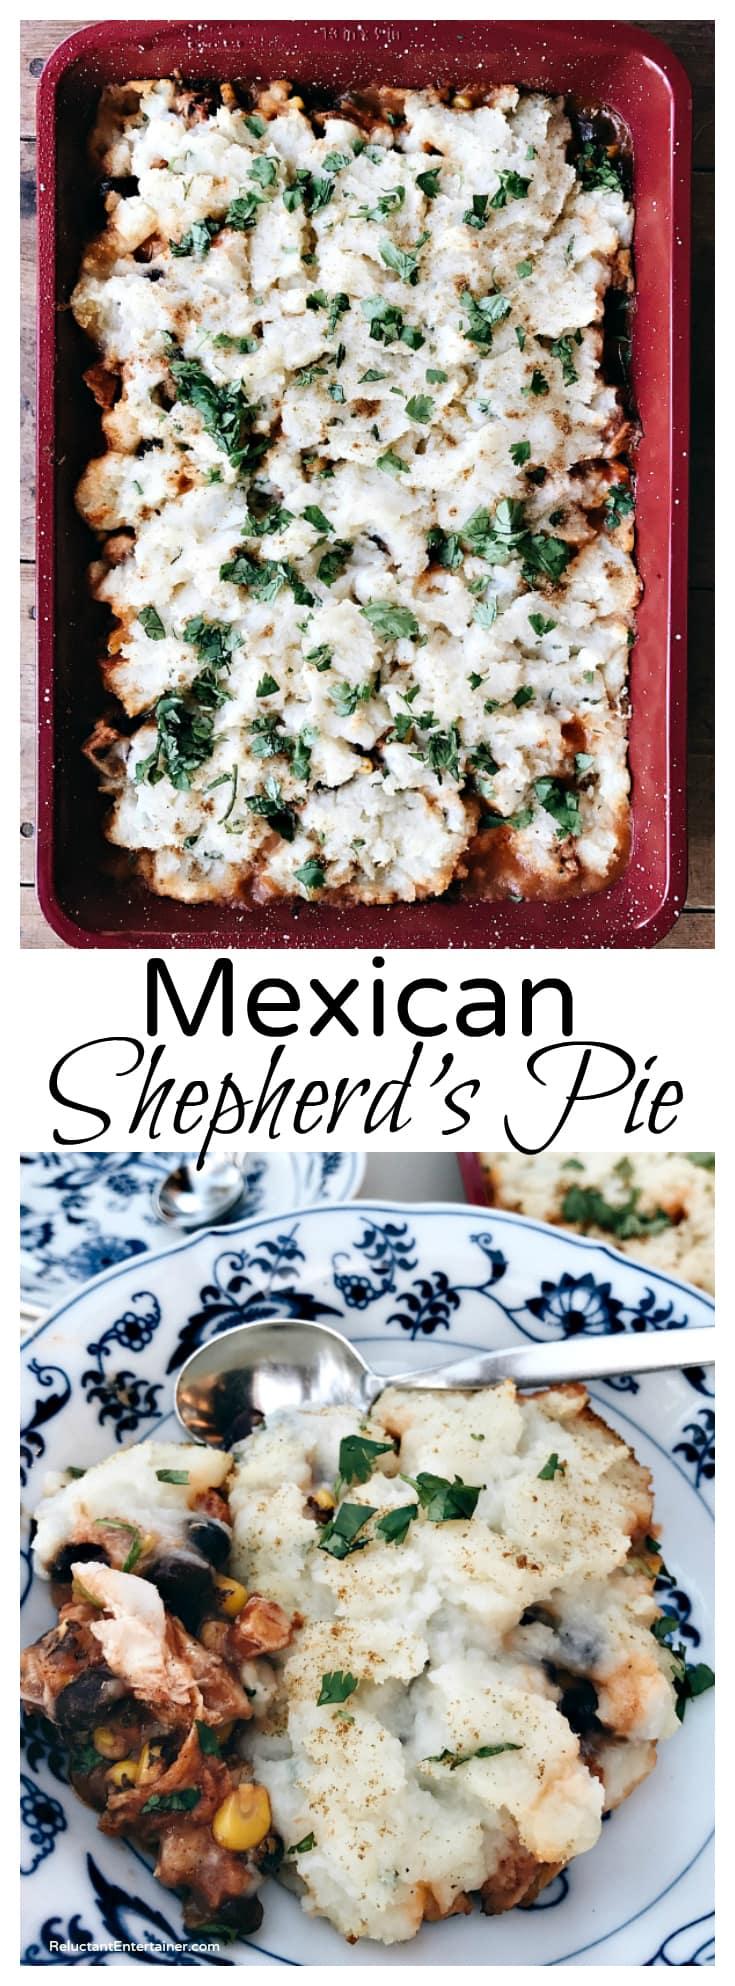 Mexican Shepherd's Pie Recipe at ReluctantEntertainer.com